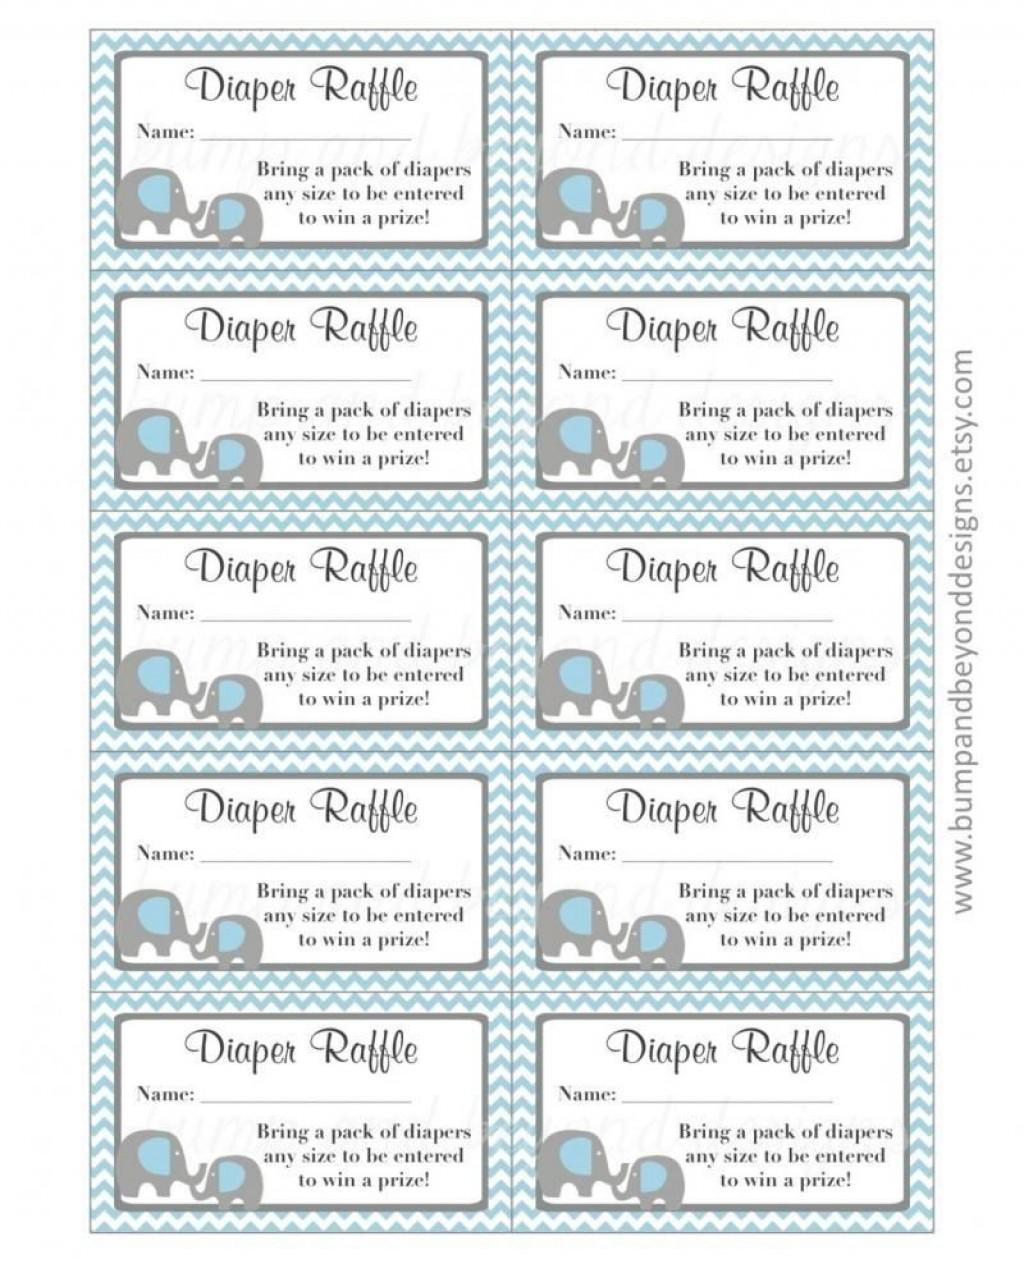 002 Formidable Diaper Raffle Ticket Template Sample  Boy Free Printable Print Black And WhiteLarge